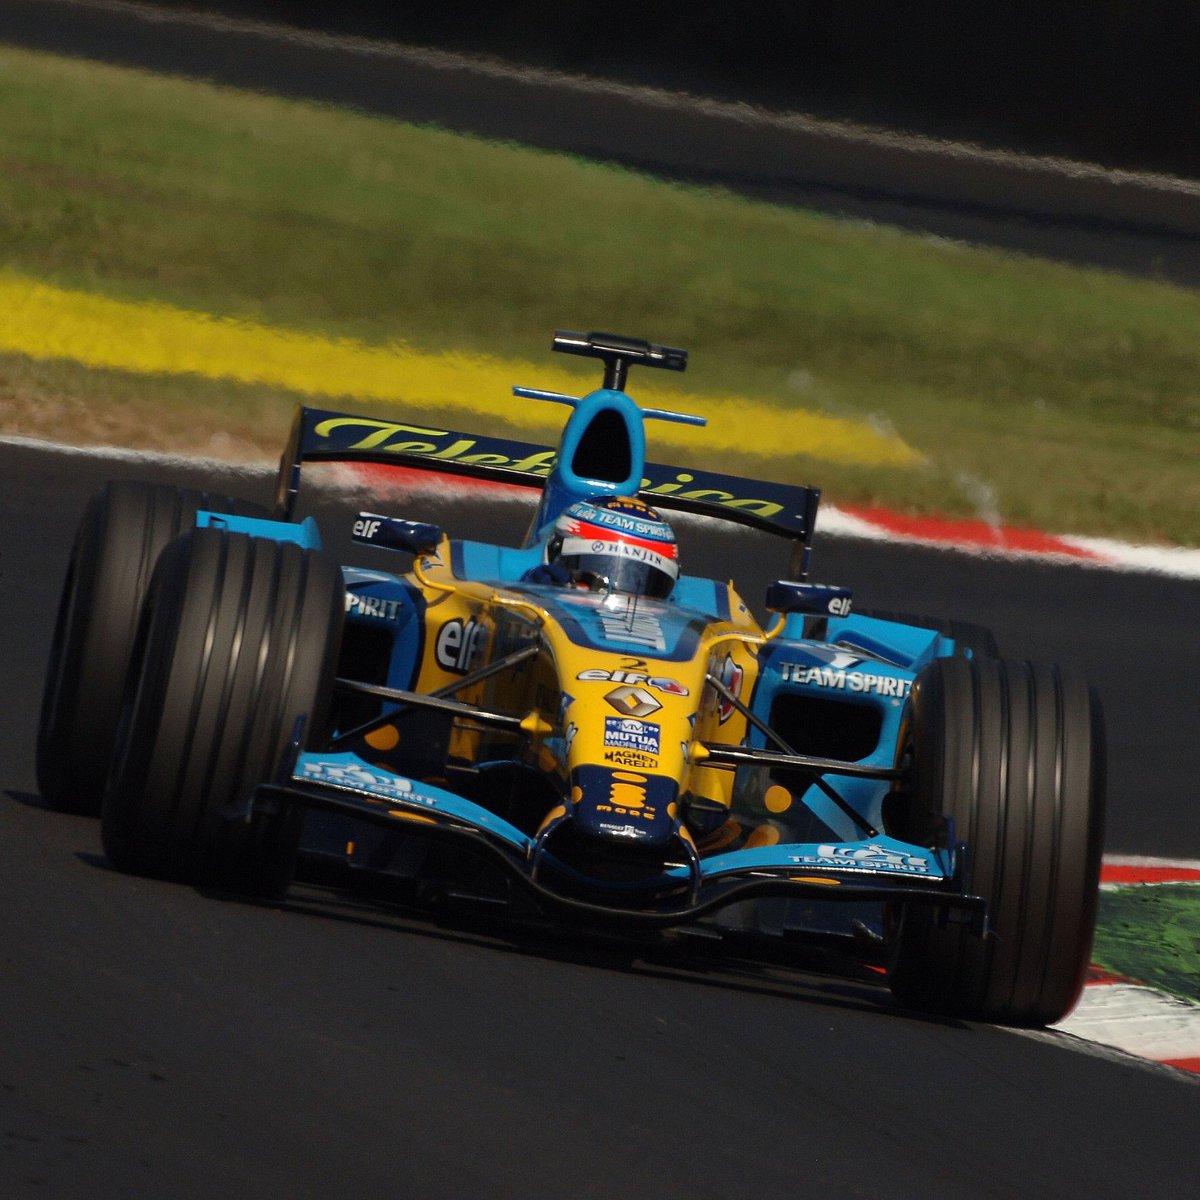 #F1 Happy Birthday @OfficialFisico<br>http://pic.twitter.com/KPIqh4v9c8